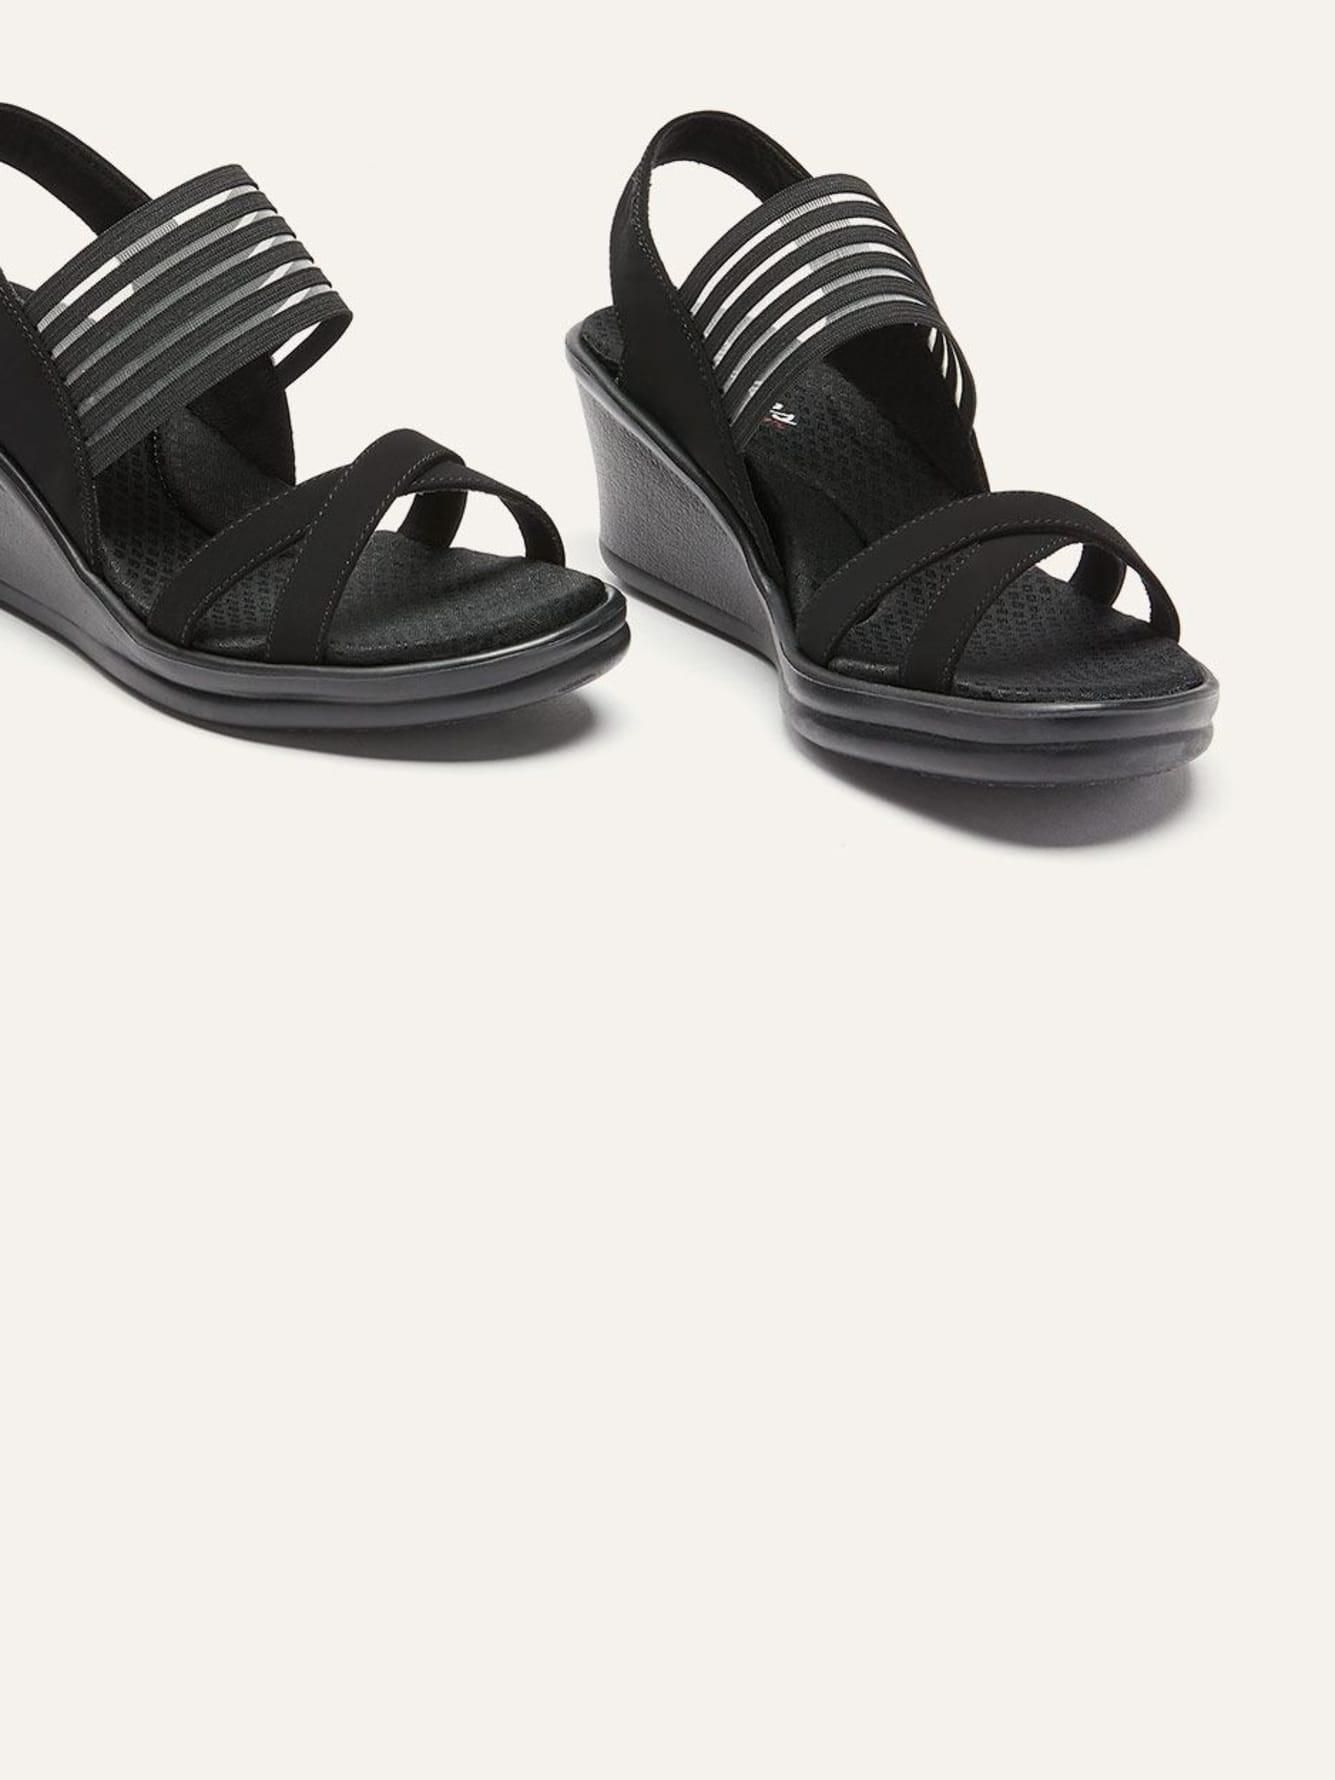 skechers slingback sandals